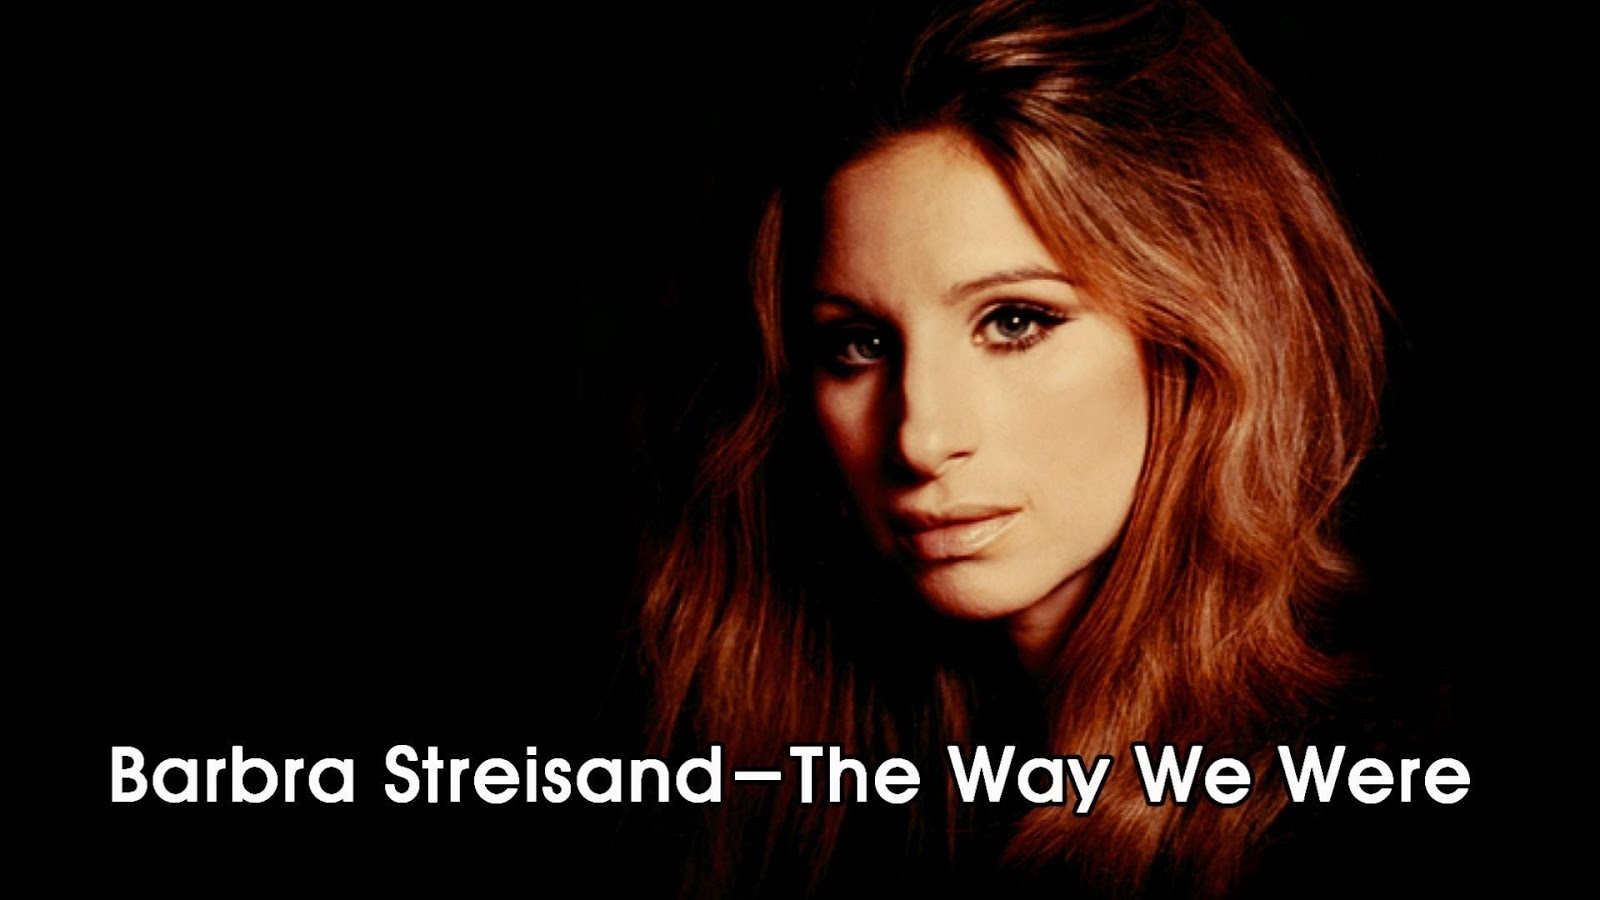 35 Barbra Streisand Wallpapers